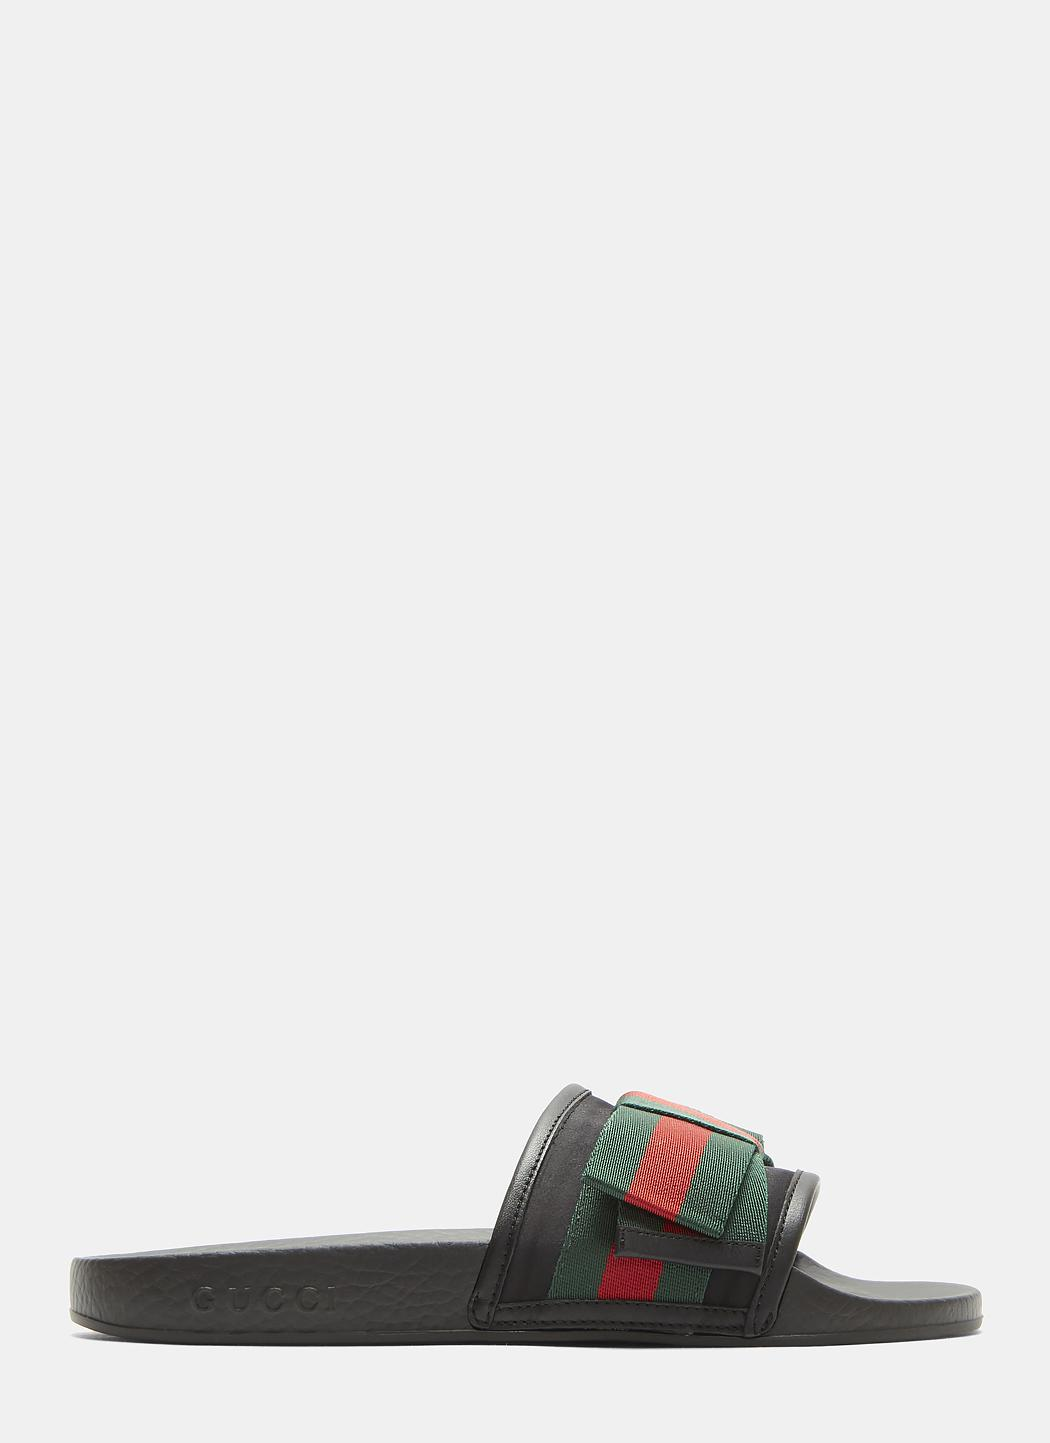 Gucci Satin Web Bow Slip-On Sandals o2txW4